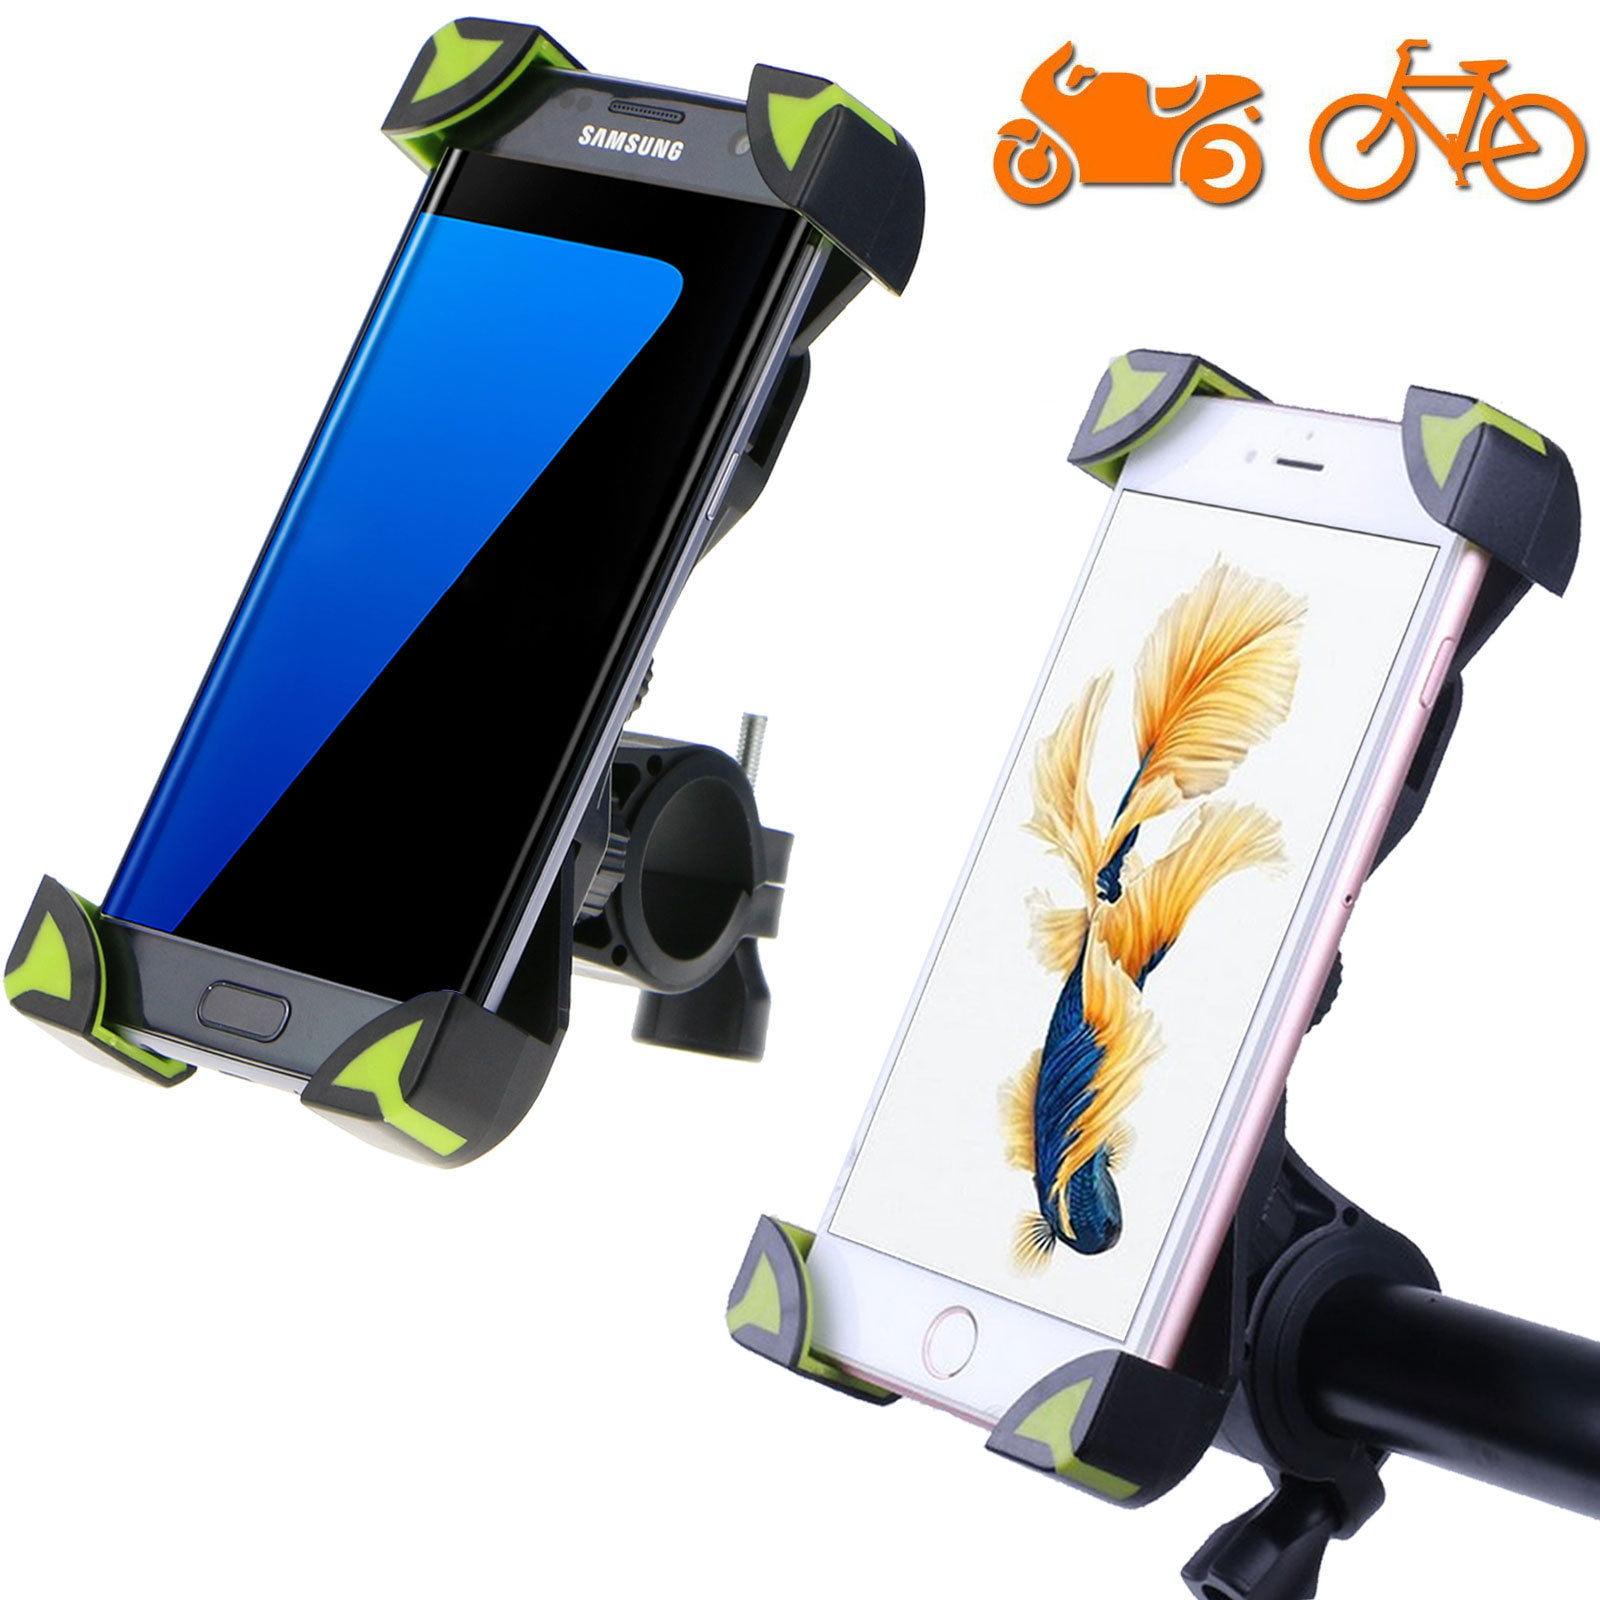 TSV Universal Motorcycle MTB Bike Bicycle Handlebar Mount Holder For Cell Phone GPS Greem